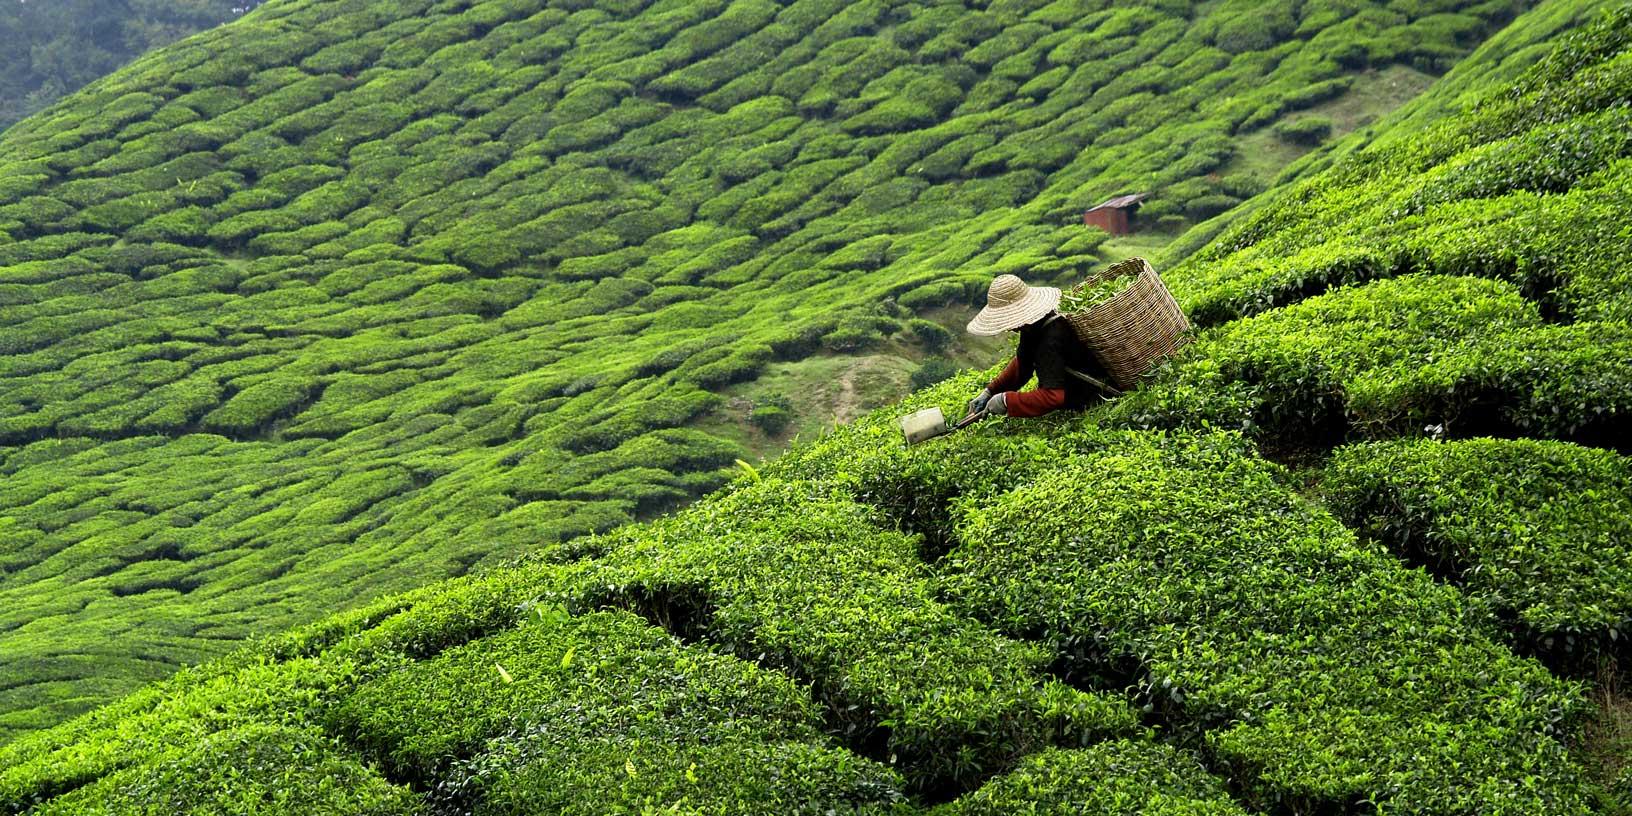 A woman plucking tea in an estate